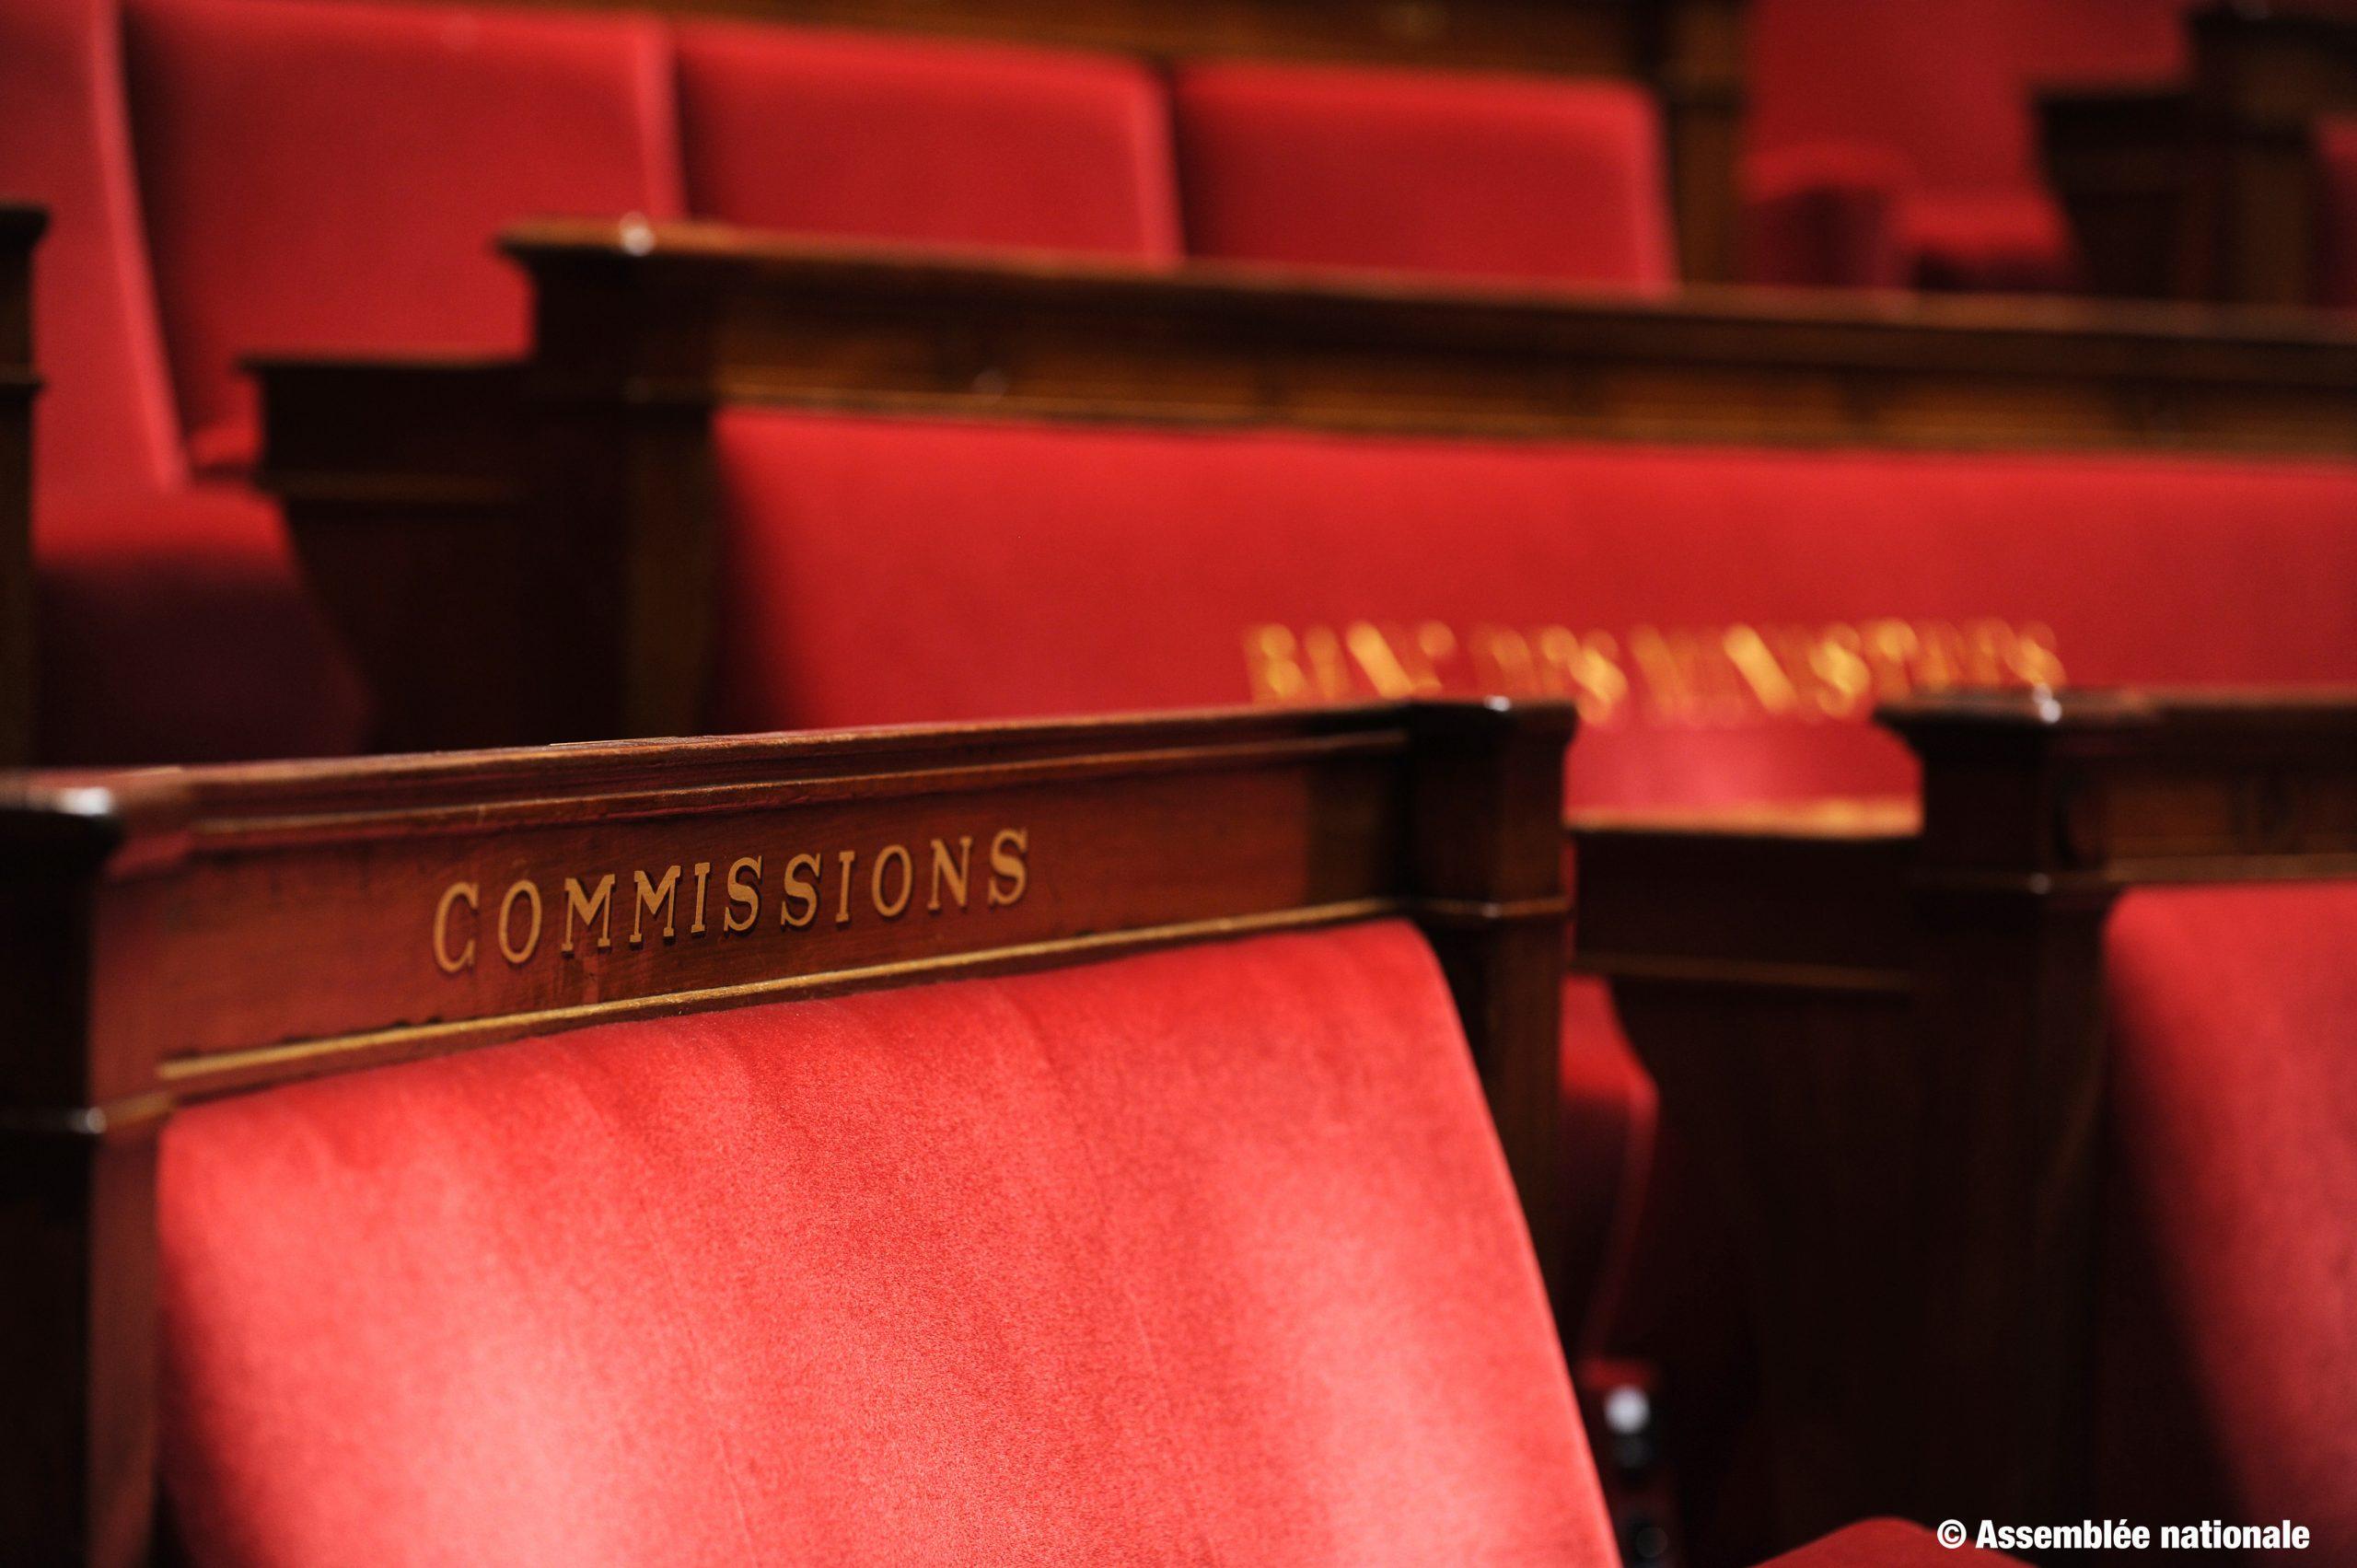 63_Assemblee_Nationale_Banc_Commissions